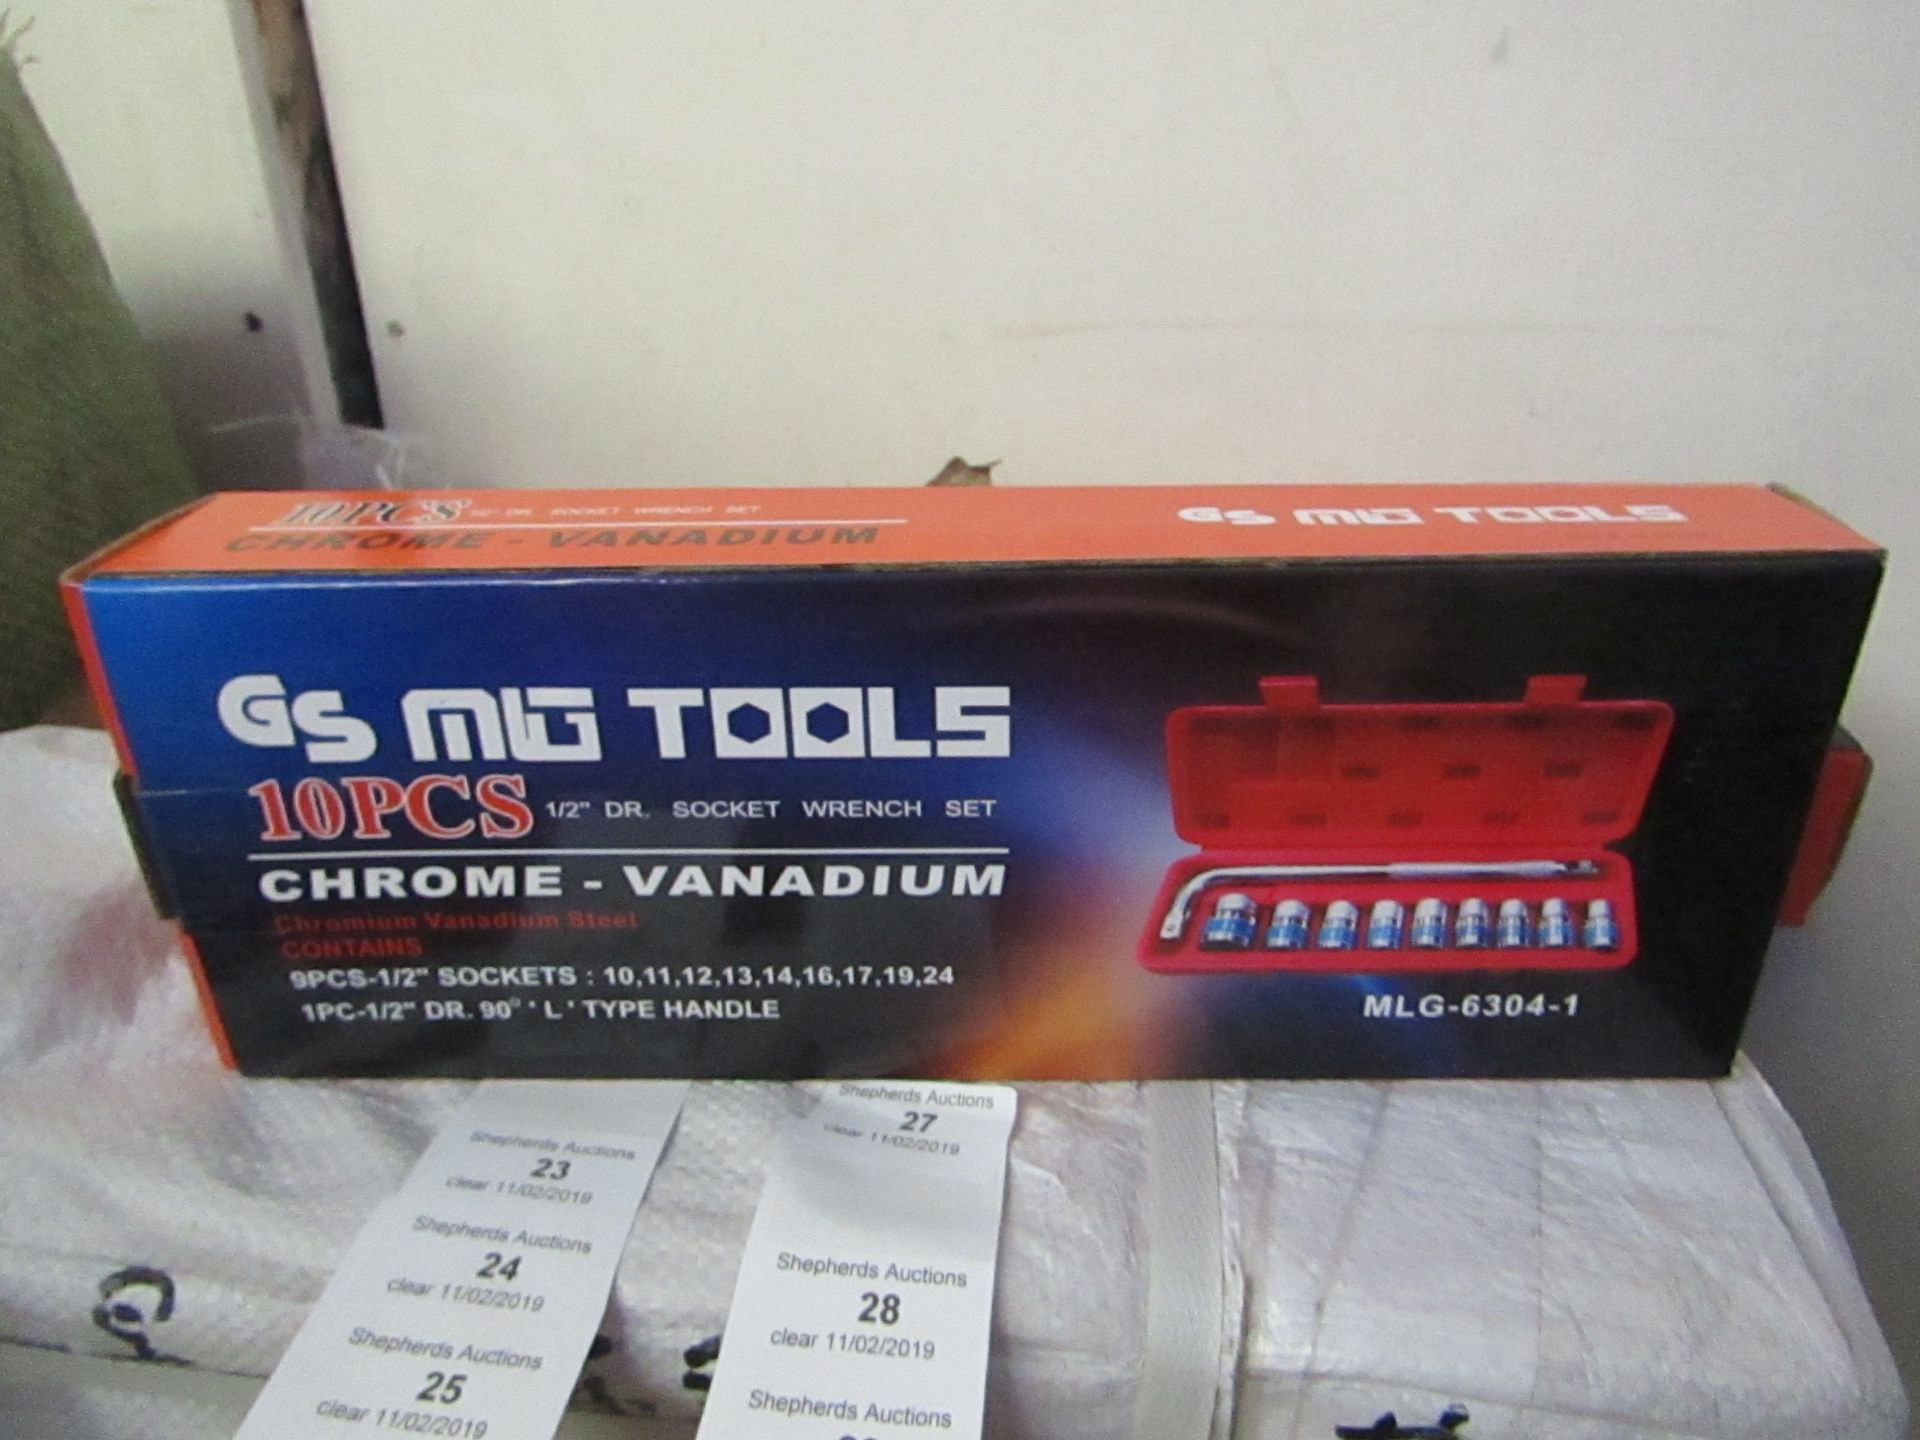 Lot 28 - 10 piece Chrome Vanadium Socket wrench set, new